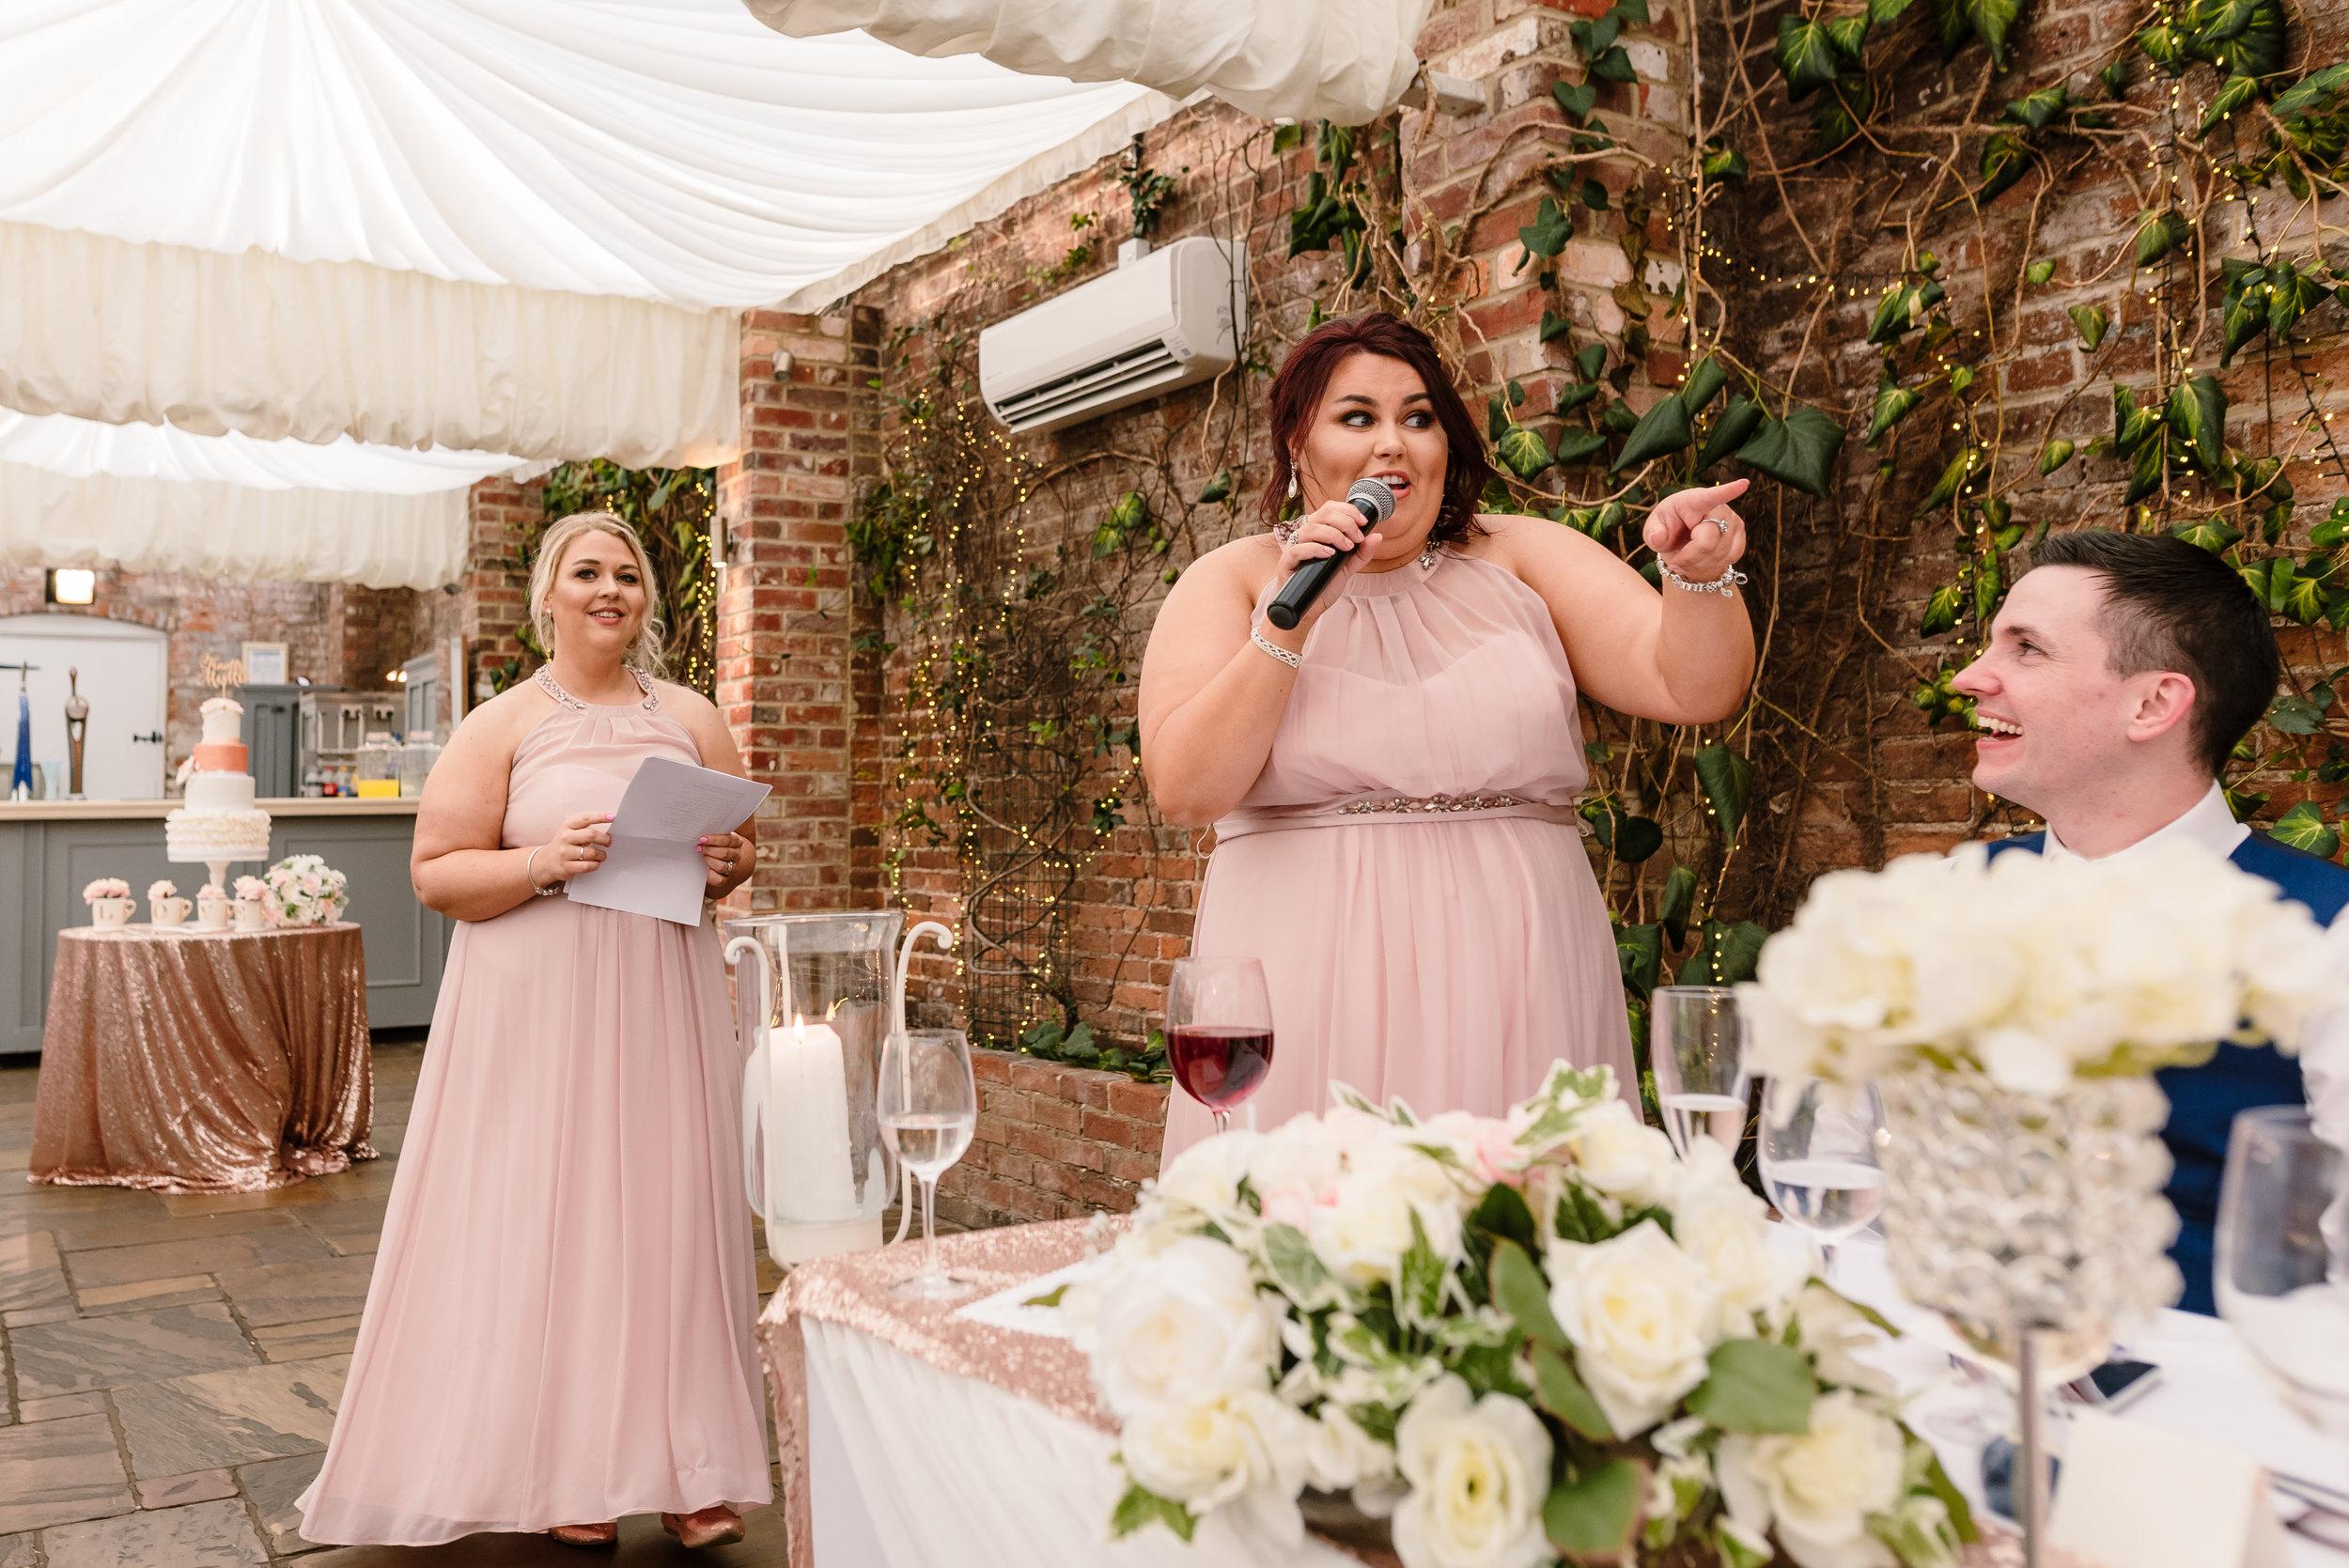 Sarah-Fishlock-Photography : Hampshire-wedding-photographer-hampshire : fleet-wedding-photographer-fleet : Northbrook-Park-Wedding-Photographer : Northbrook-Park-Wedding-Venue : natural-wedding-photographer-hampshire